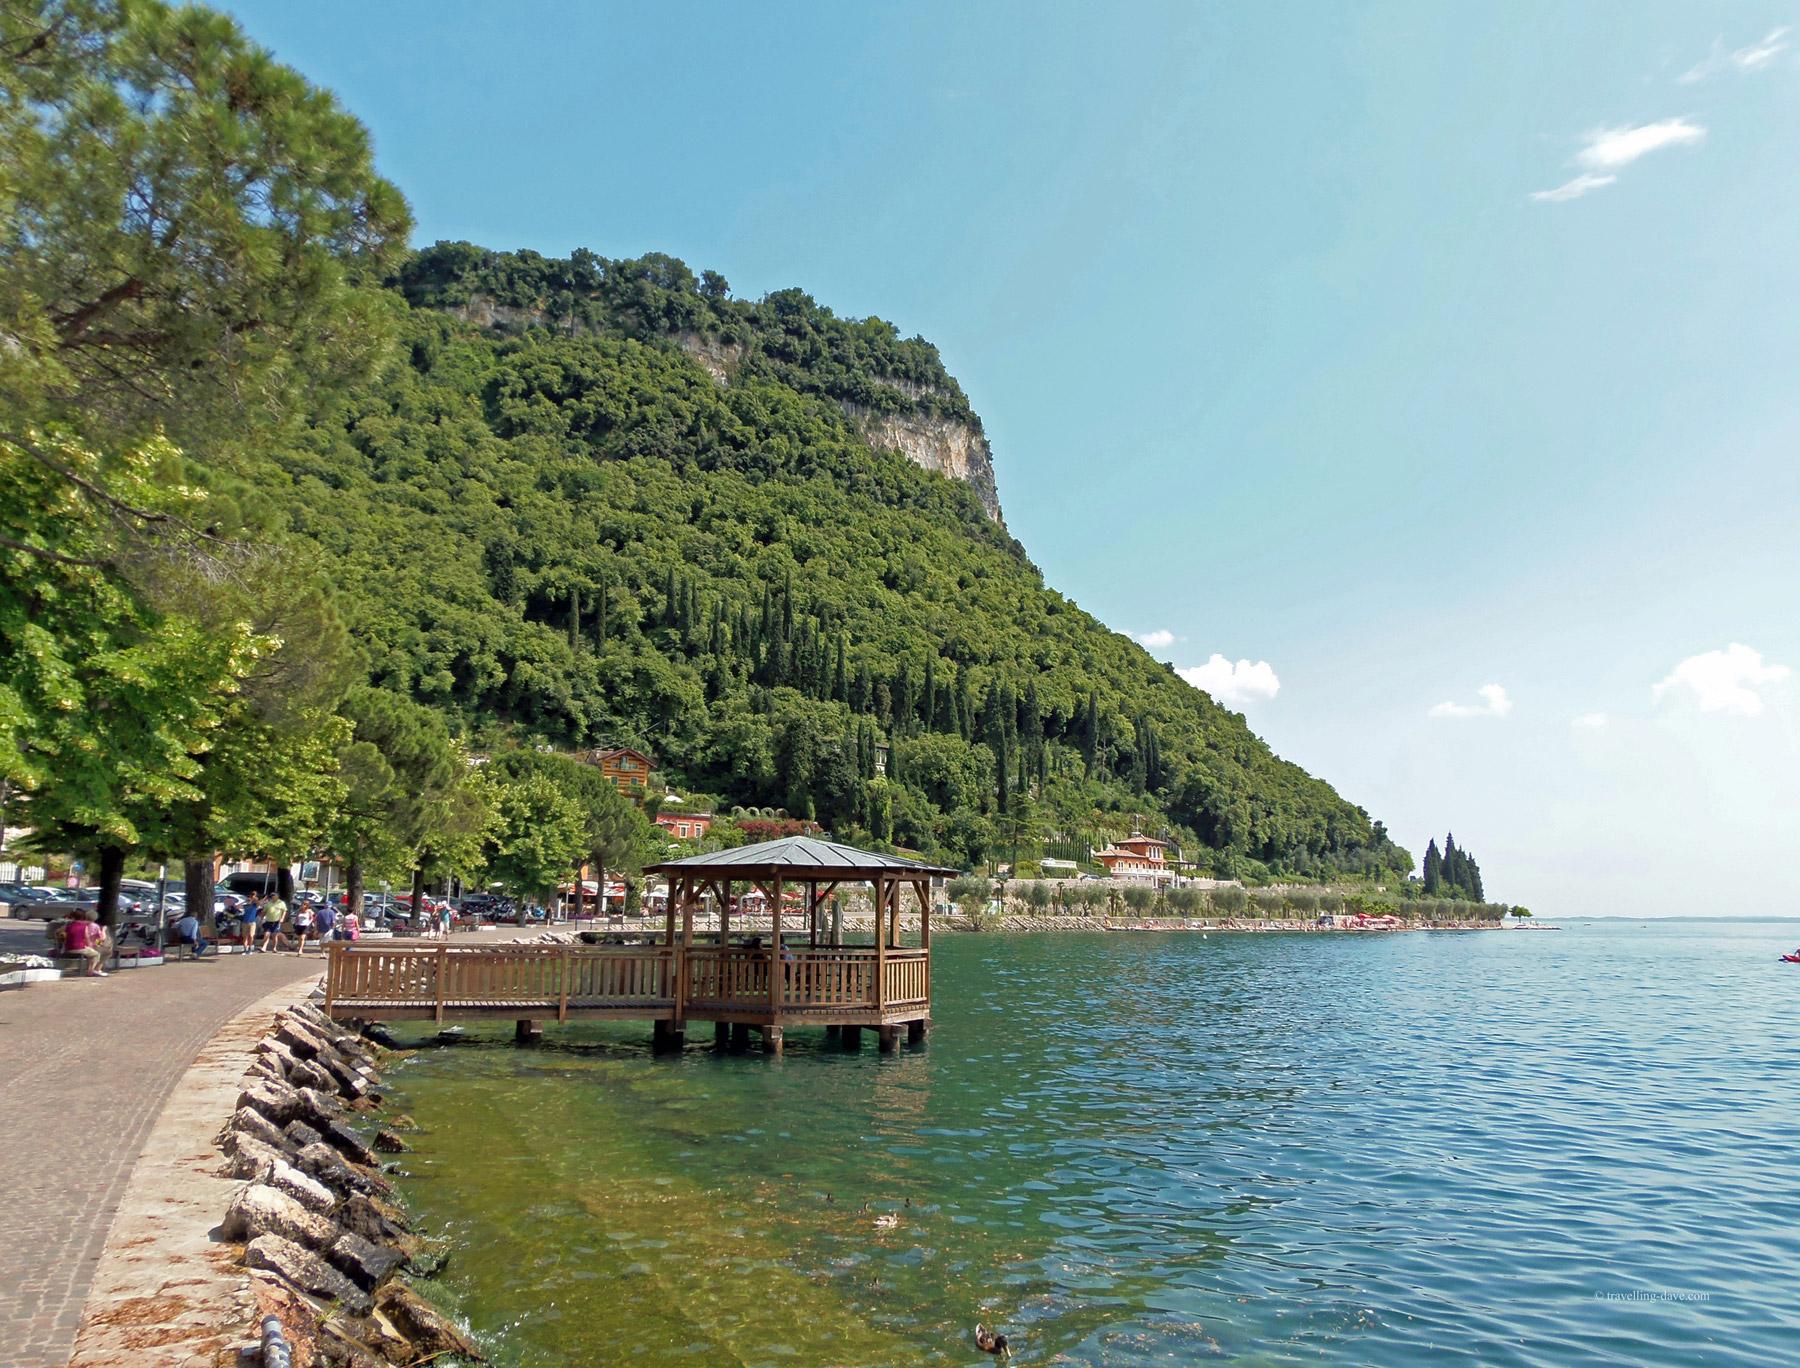 The Rock of Garda in Italy